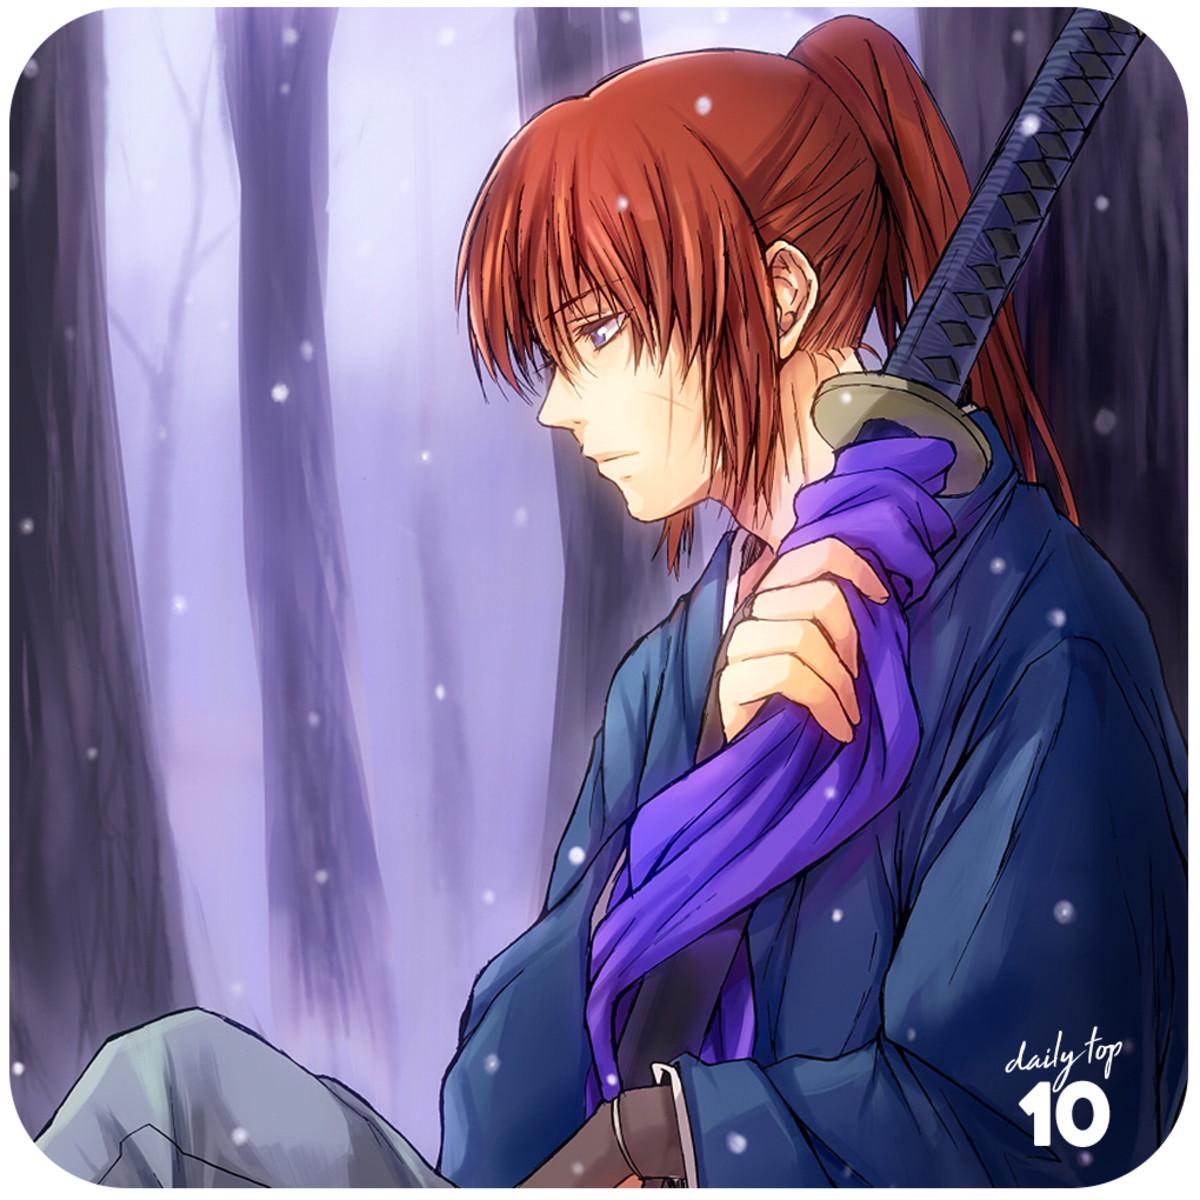 Kenshin resting under a tree